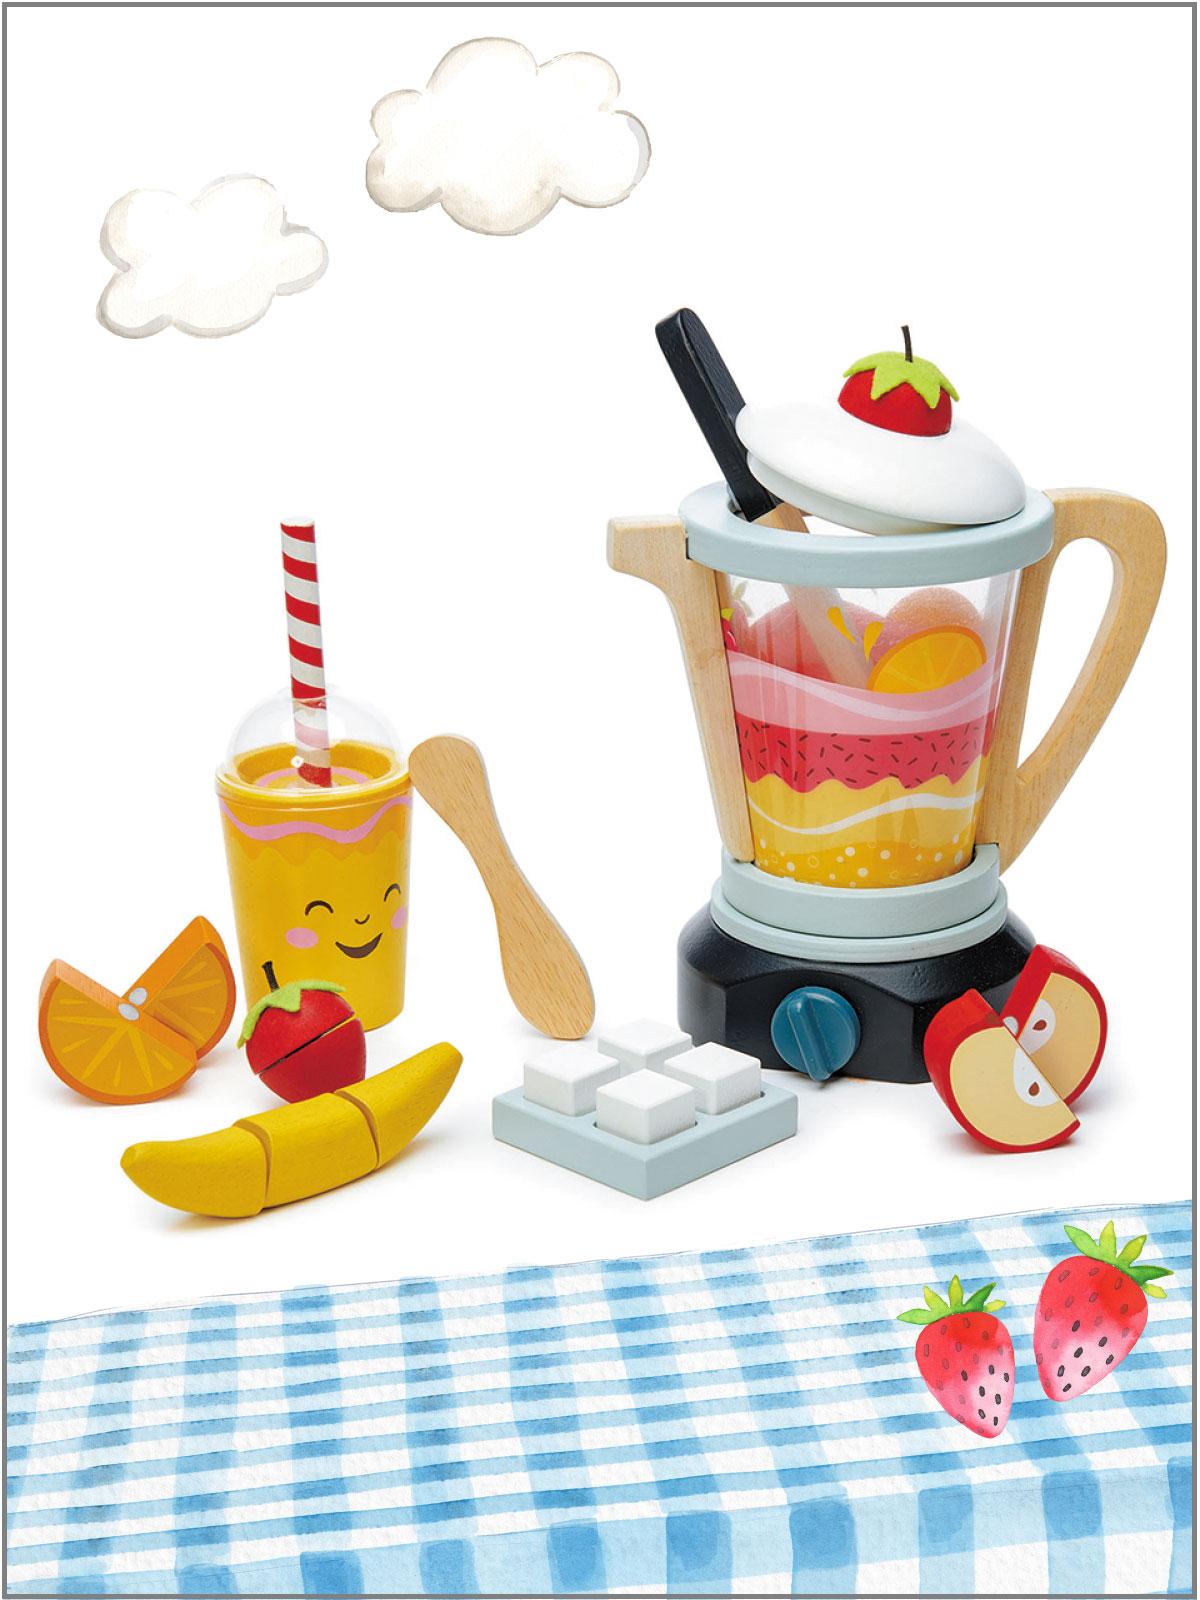 frederickandsophie-kids-toys-tender_leaf-juice-smoothie-blender-pretend-play